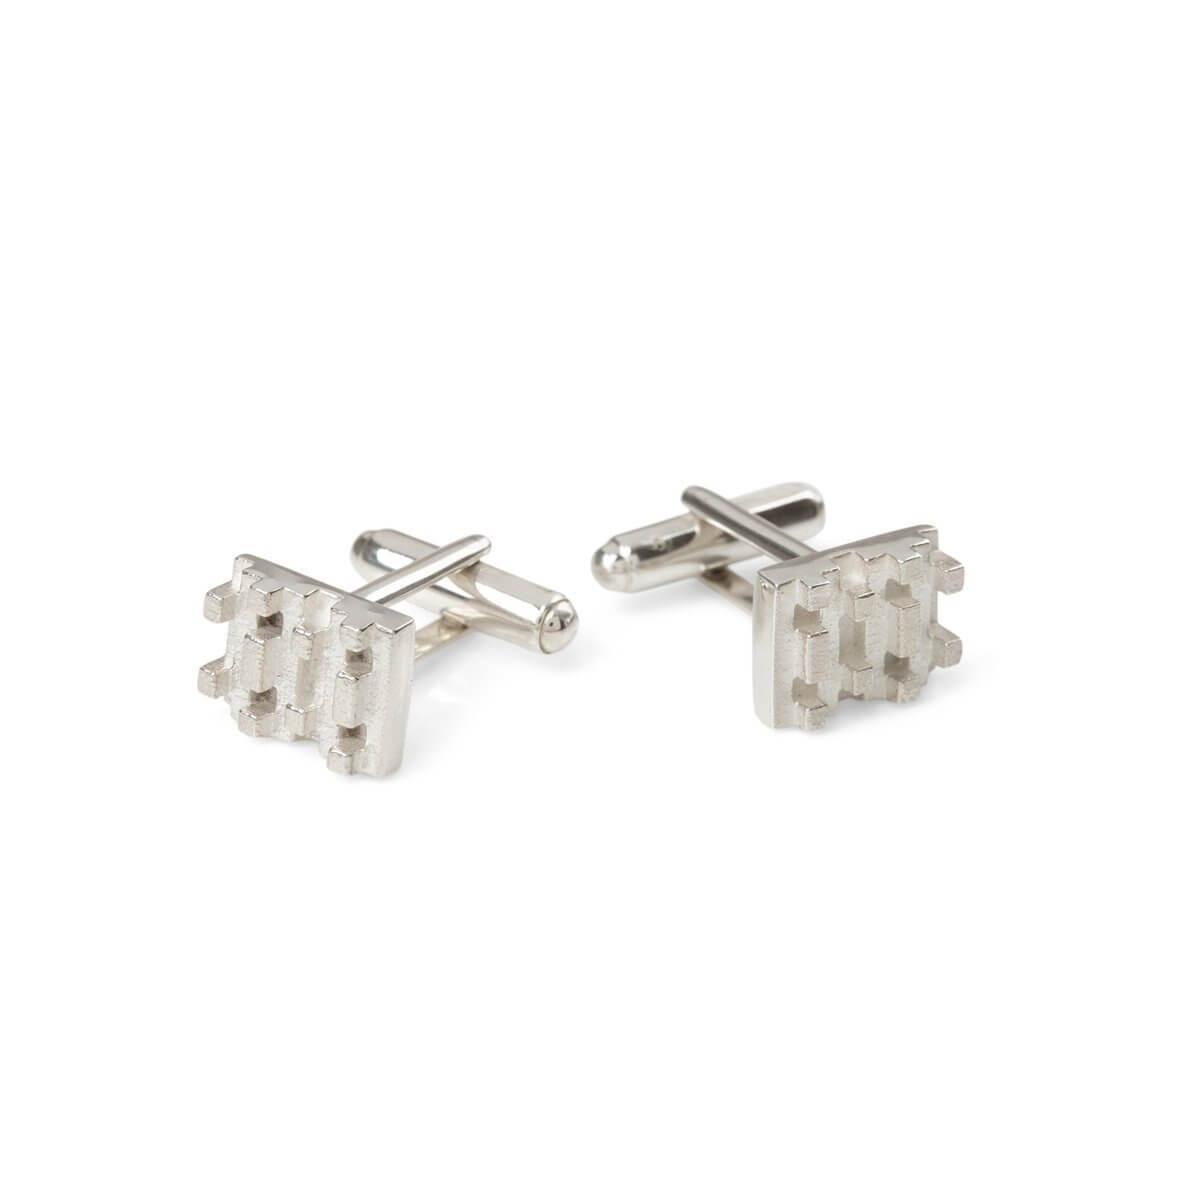 Hive lego cufflinks Sterling Silver